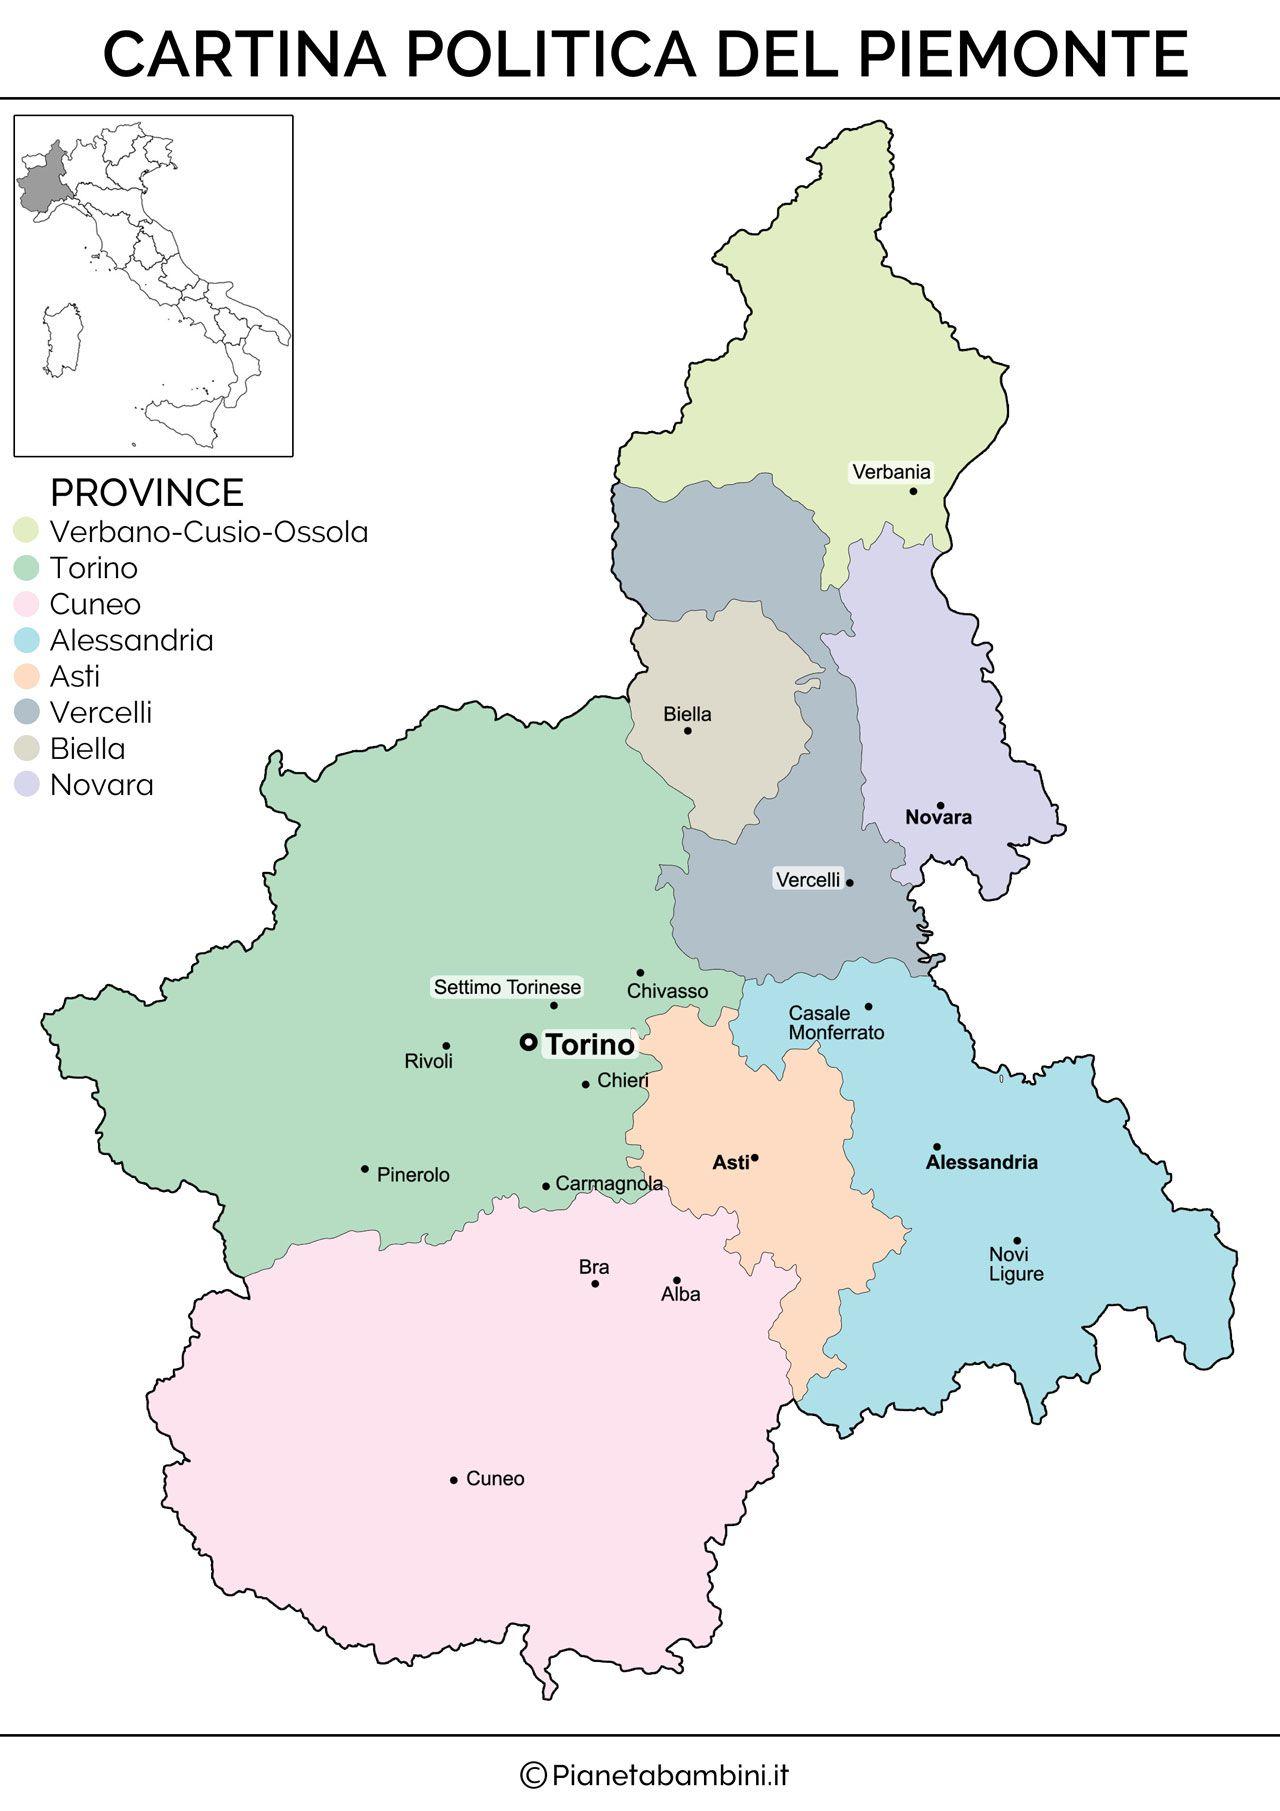 Cartina Fisica E Politica Del Piemonte.Cartina Muta Fisica E Politica Del Piemonte Da Stampare